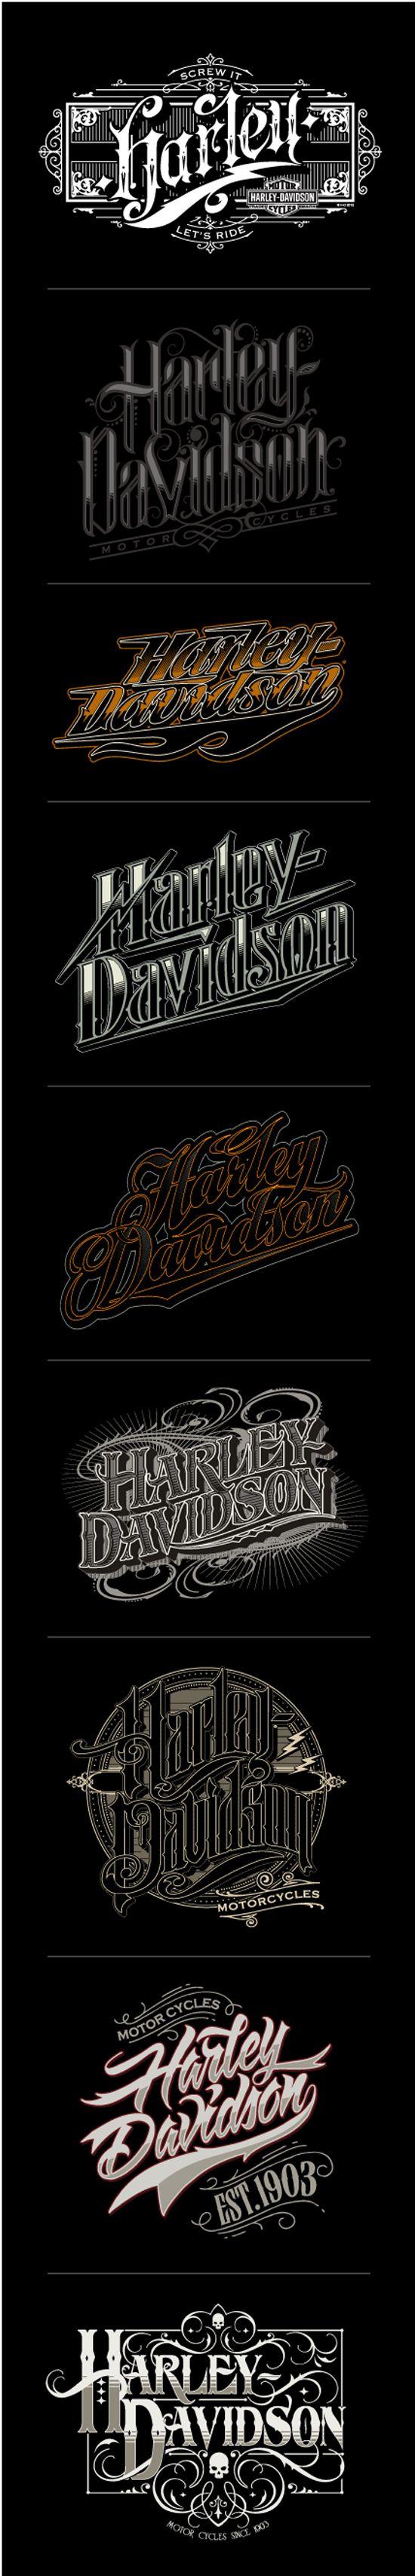 Harley Davidson custom lettering | Sweyda, Typography, type, custom lettering, hand lettering, vector, vector illustration, action sports